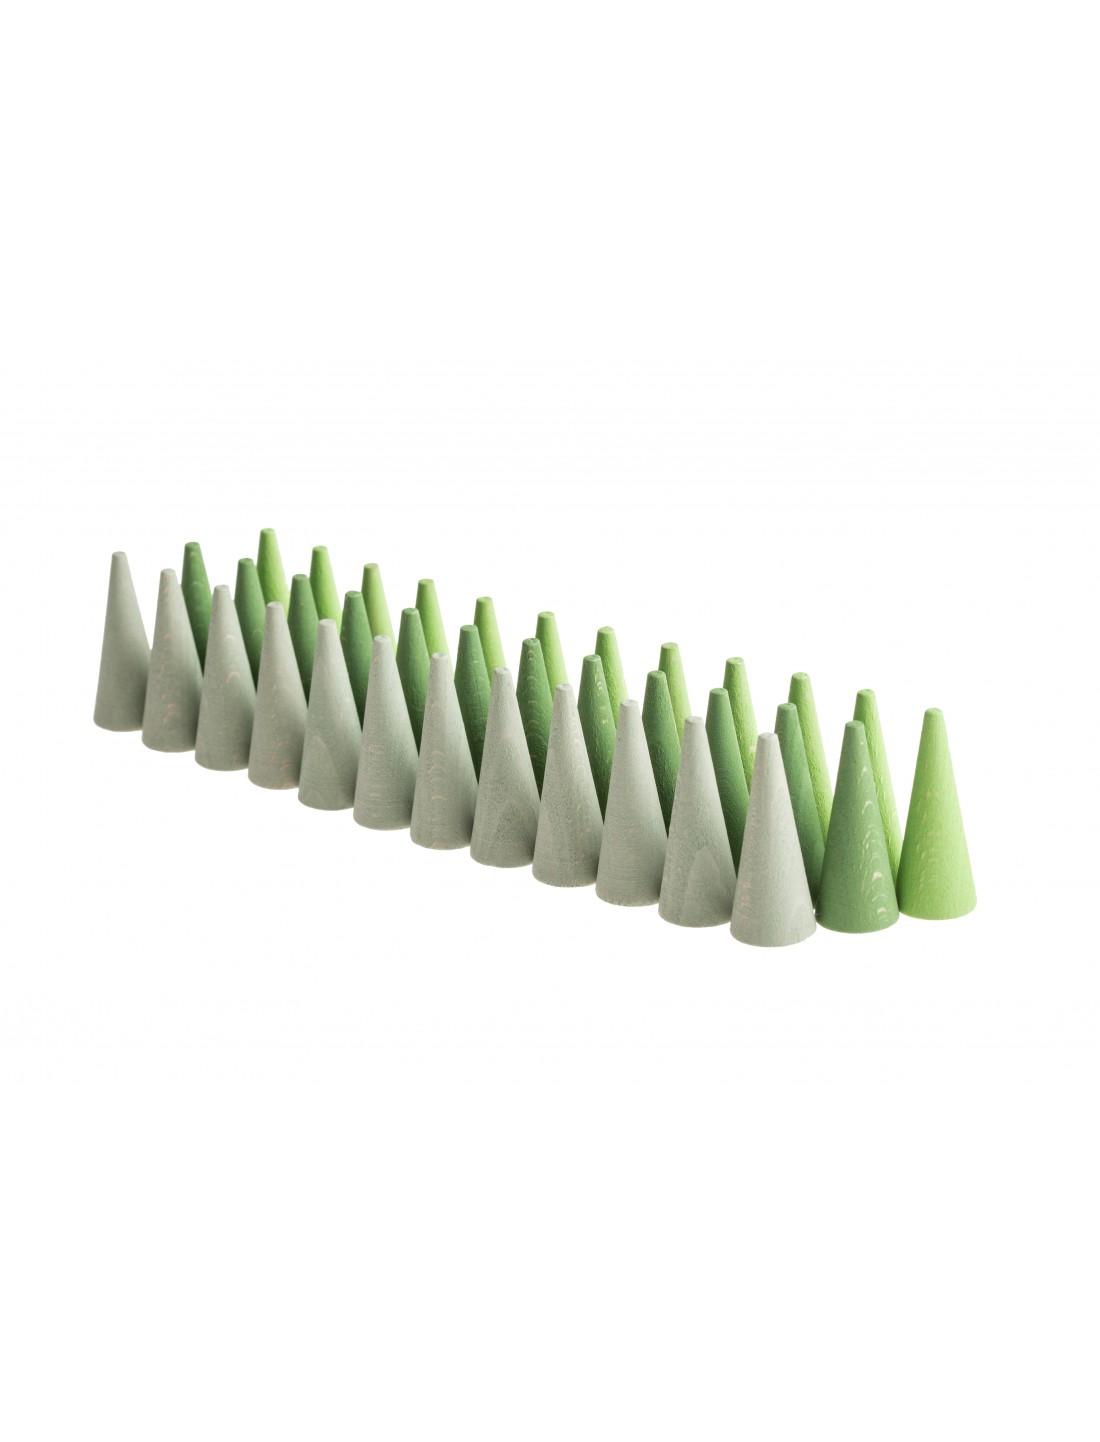 Mandala pequeños conos verdes. Grapat